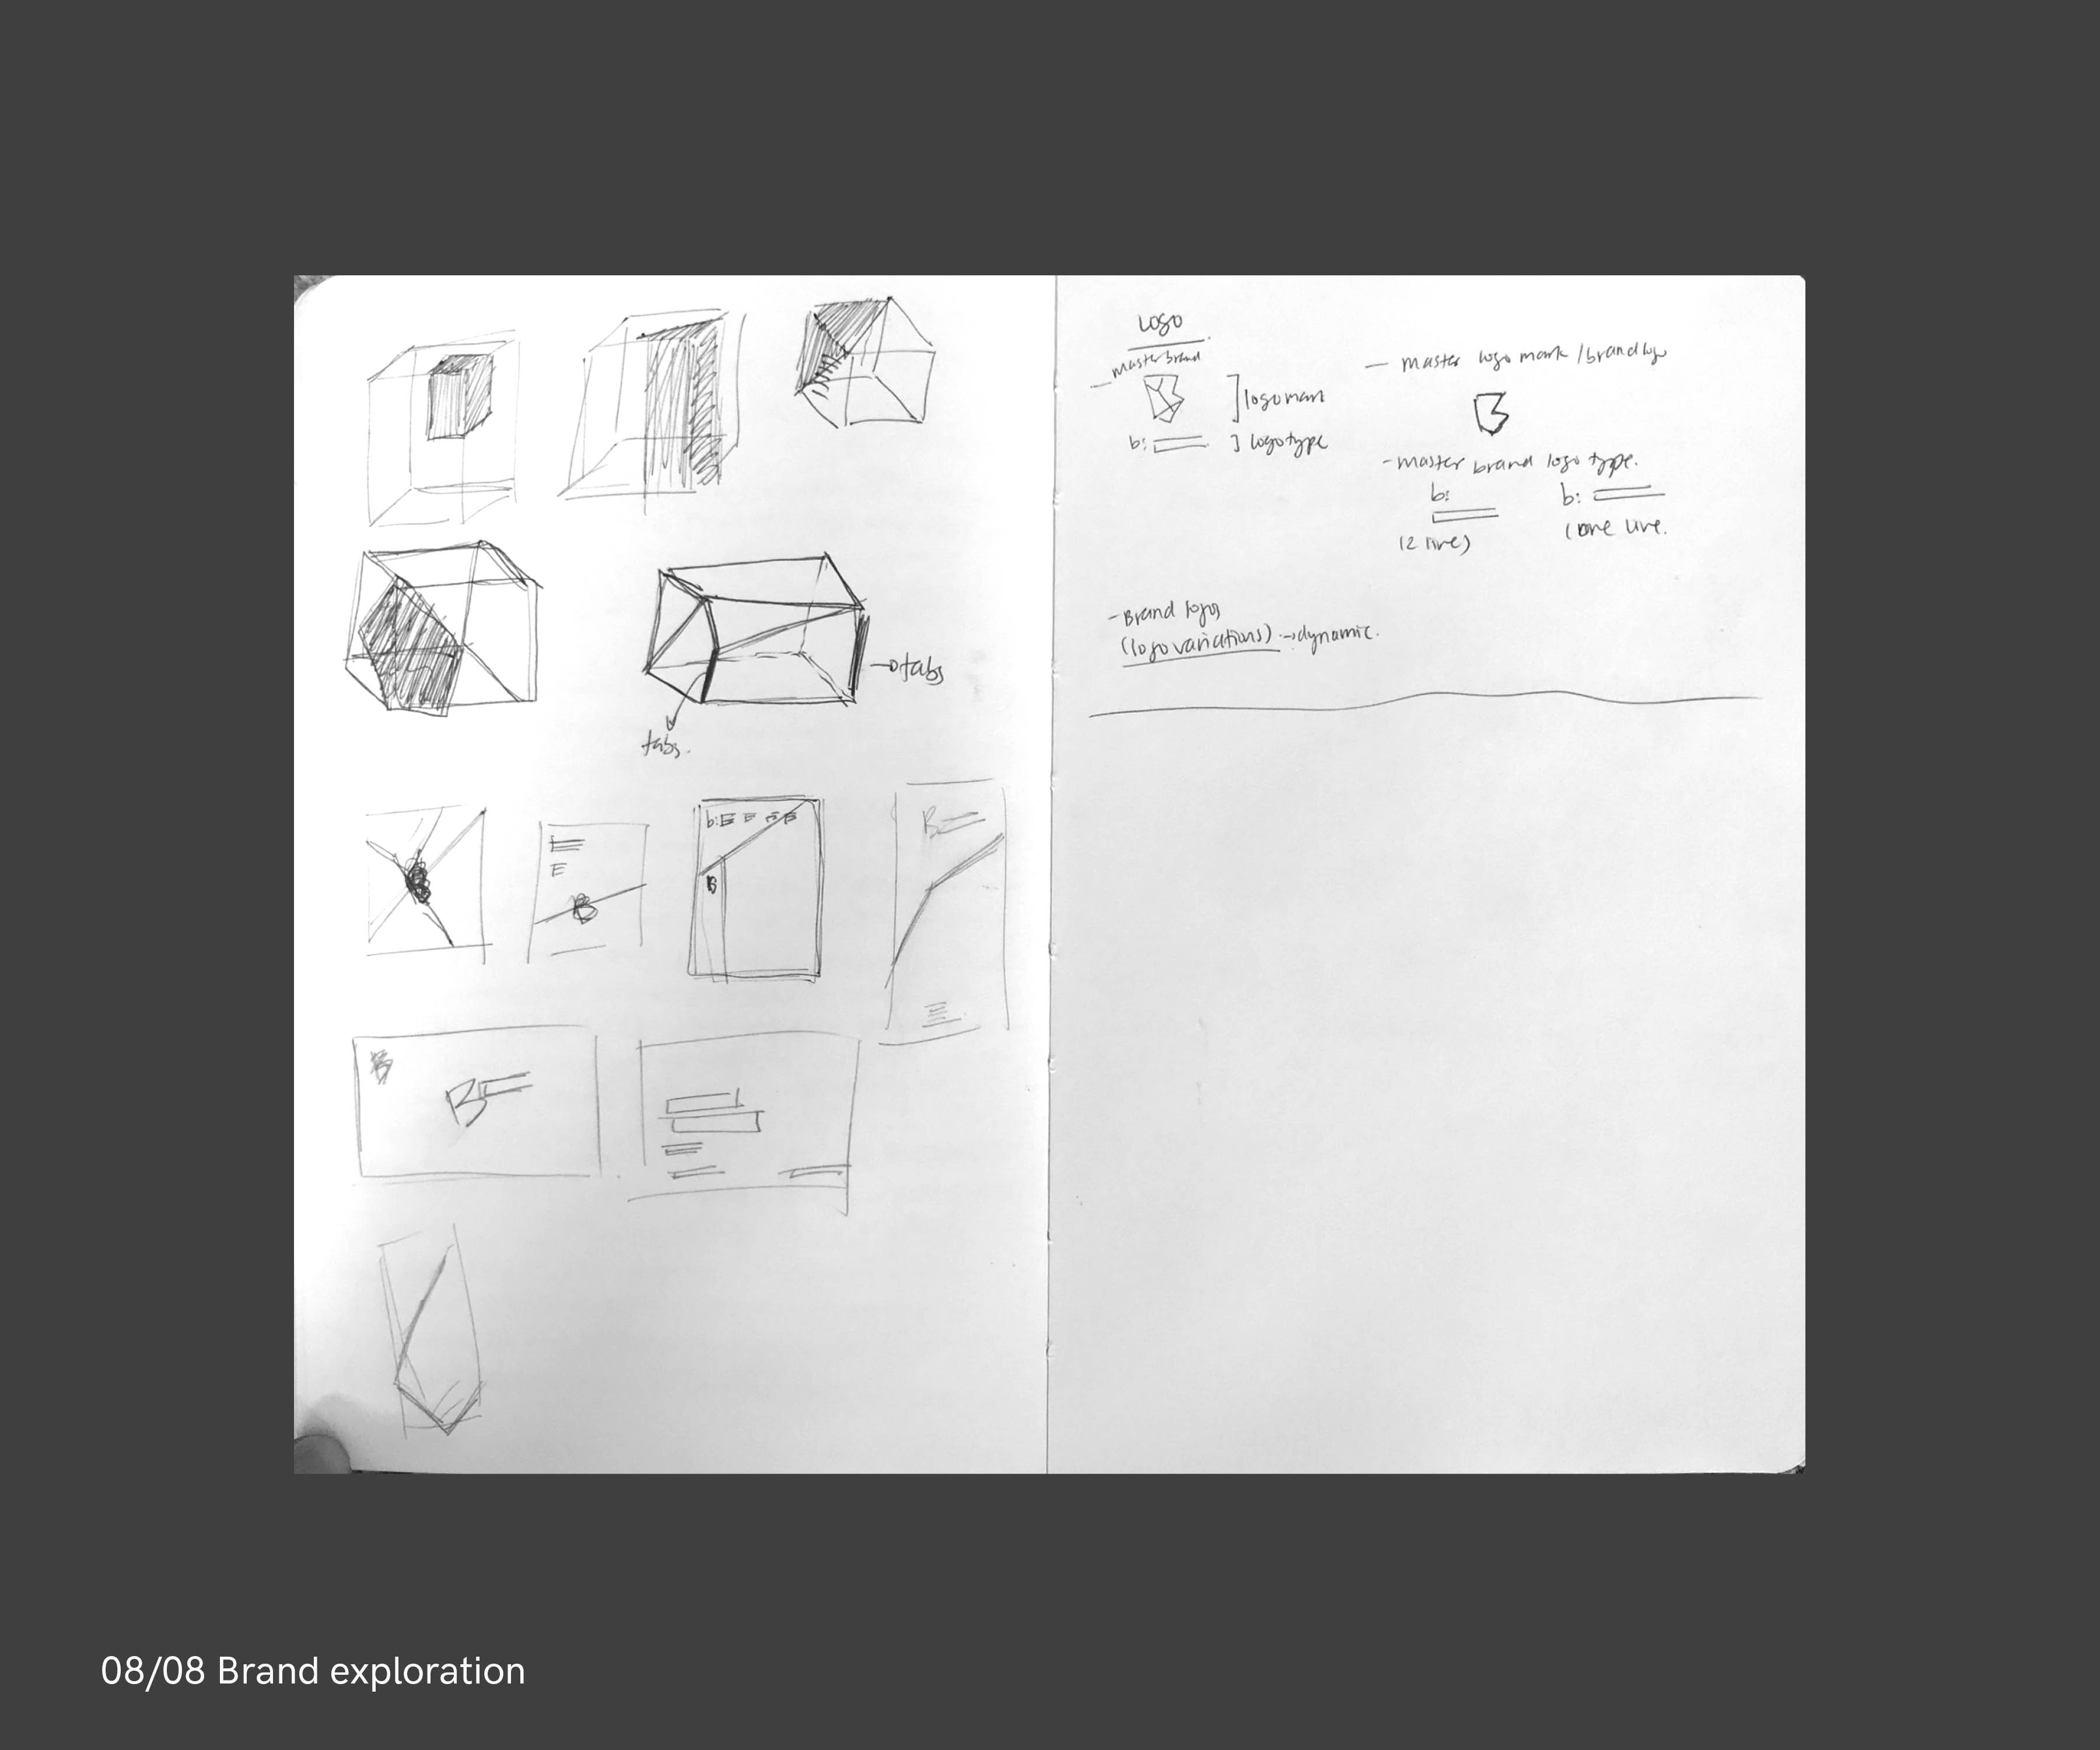 b_process_logo2_sketches-8.1